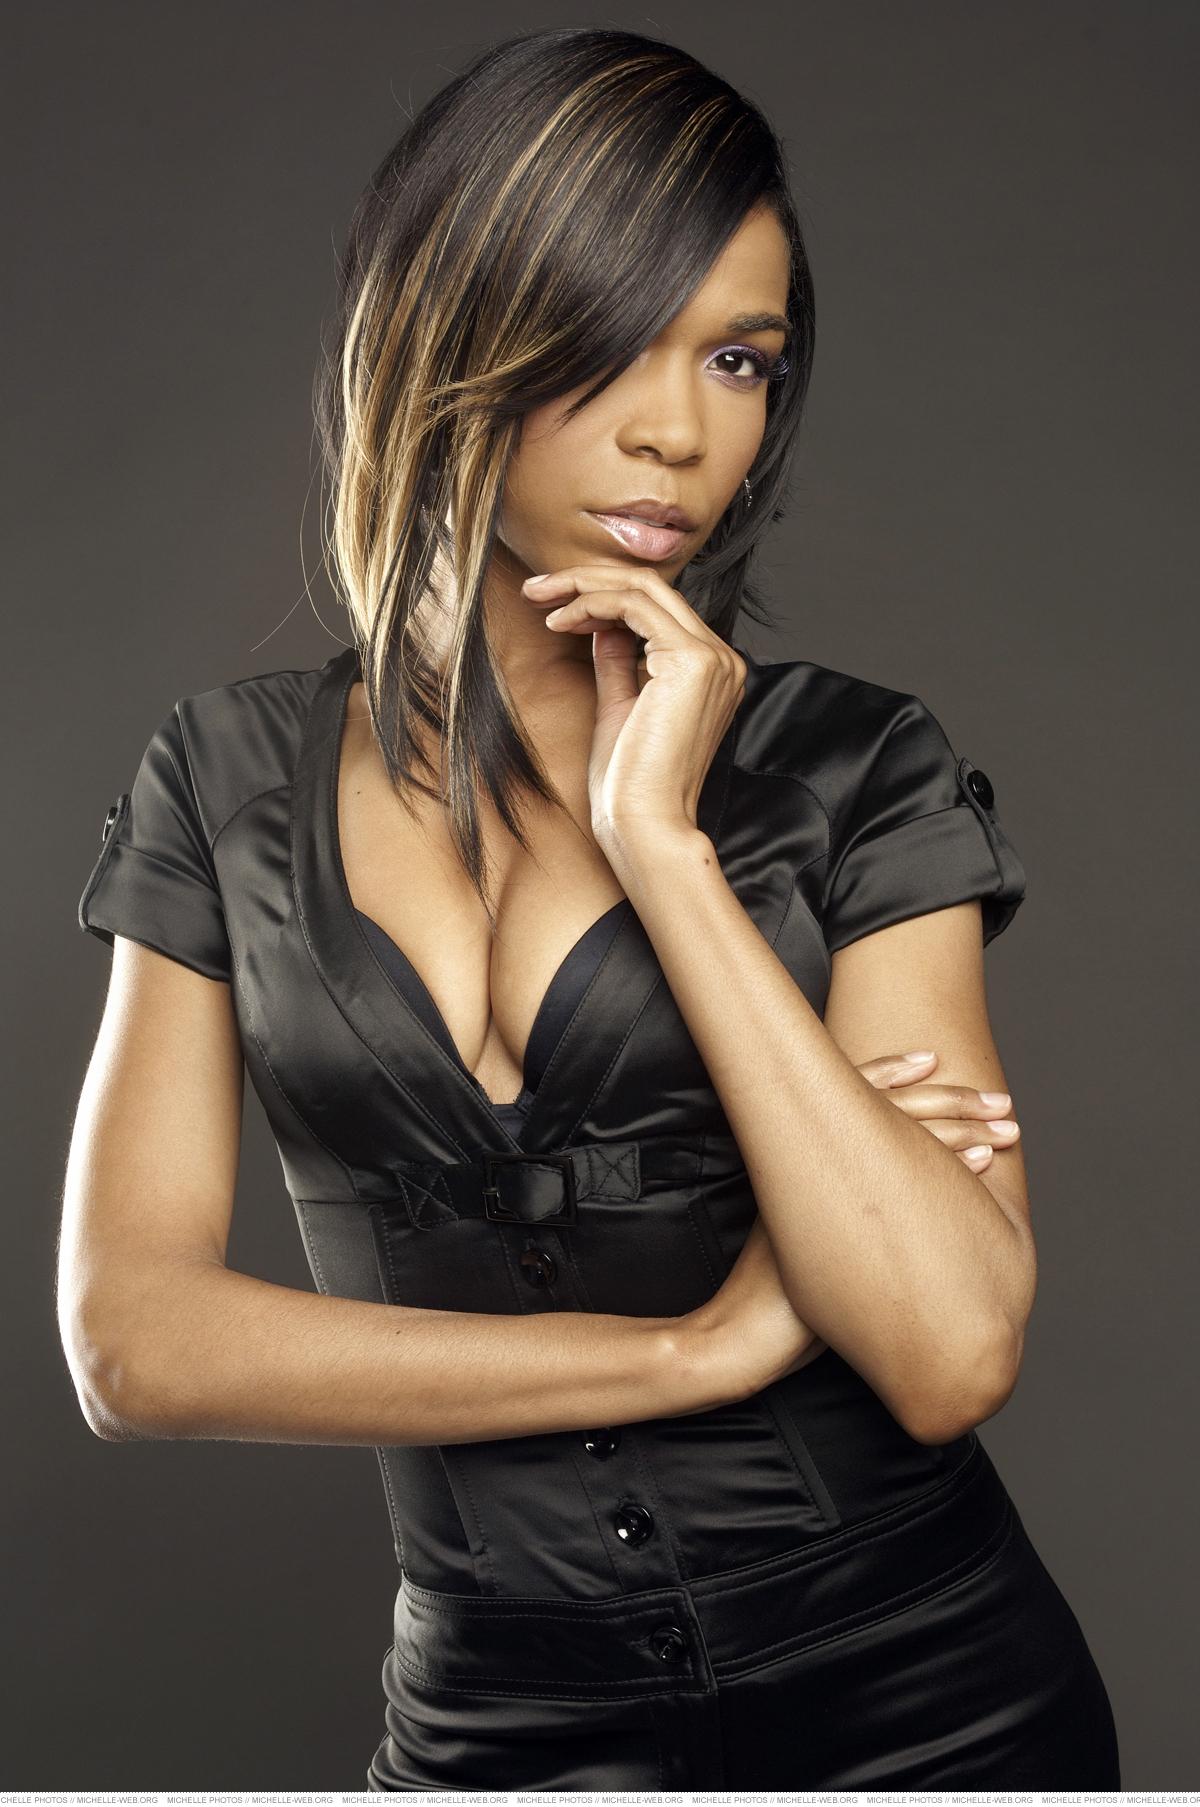 Michelle michelle williams singer photo 5840056 fanpop